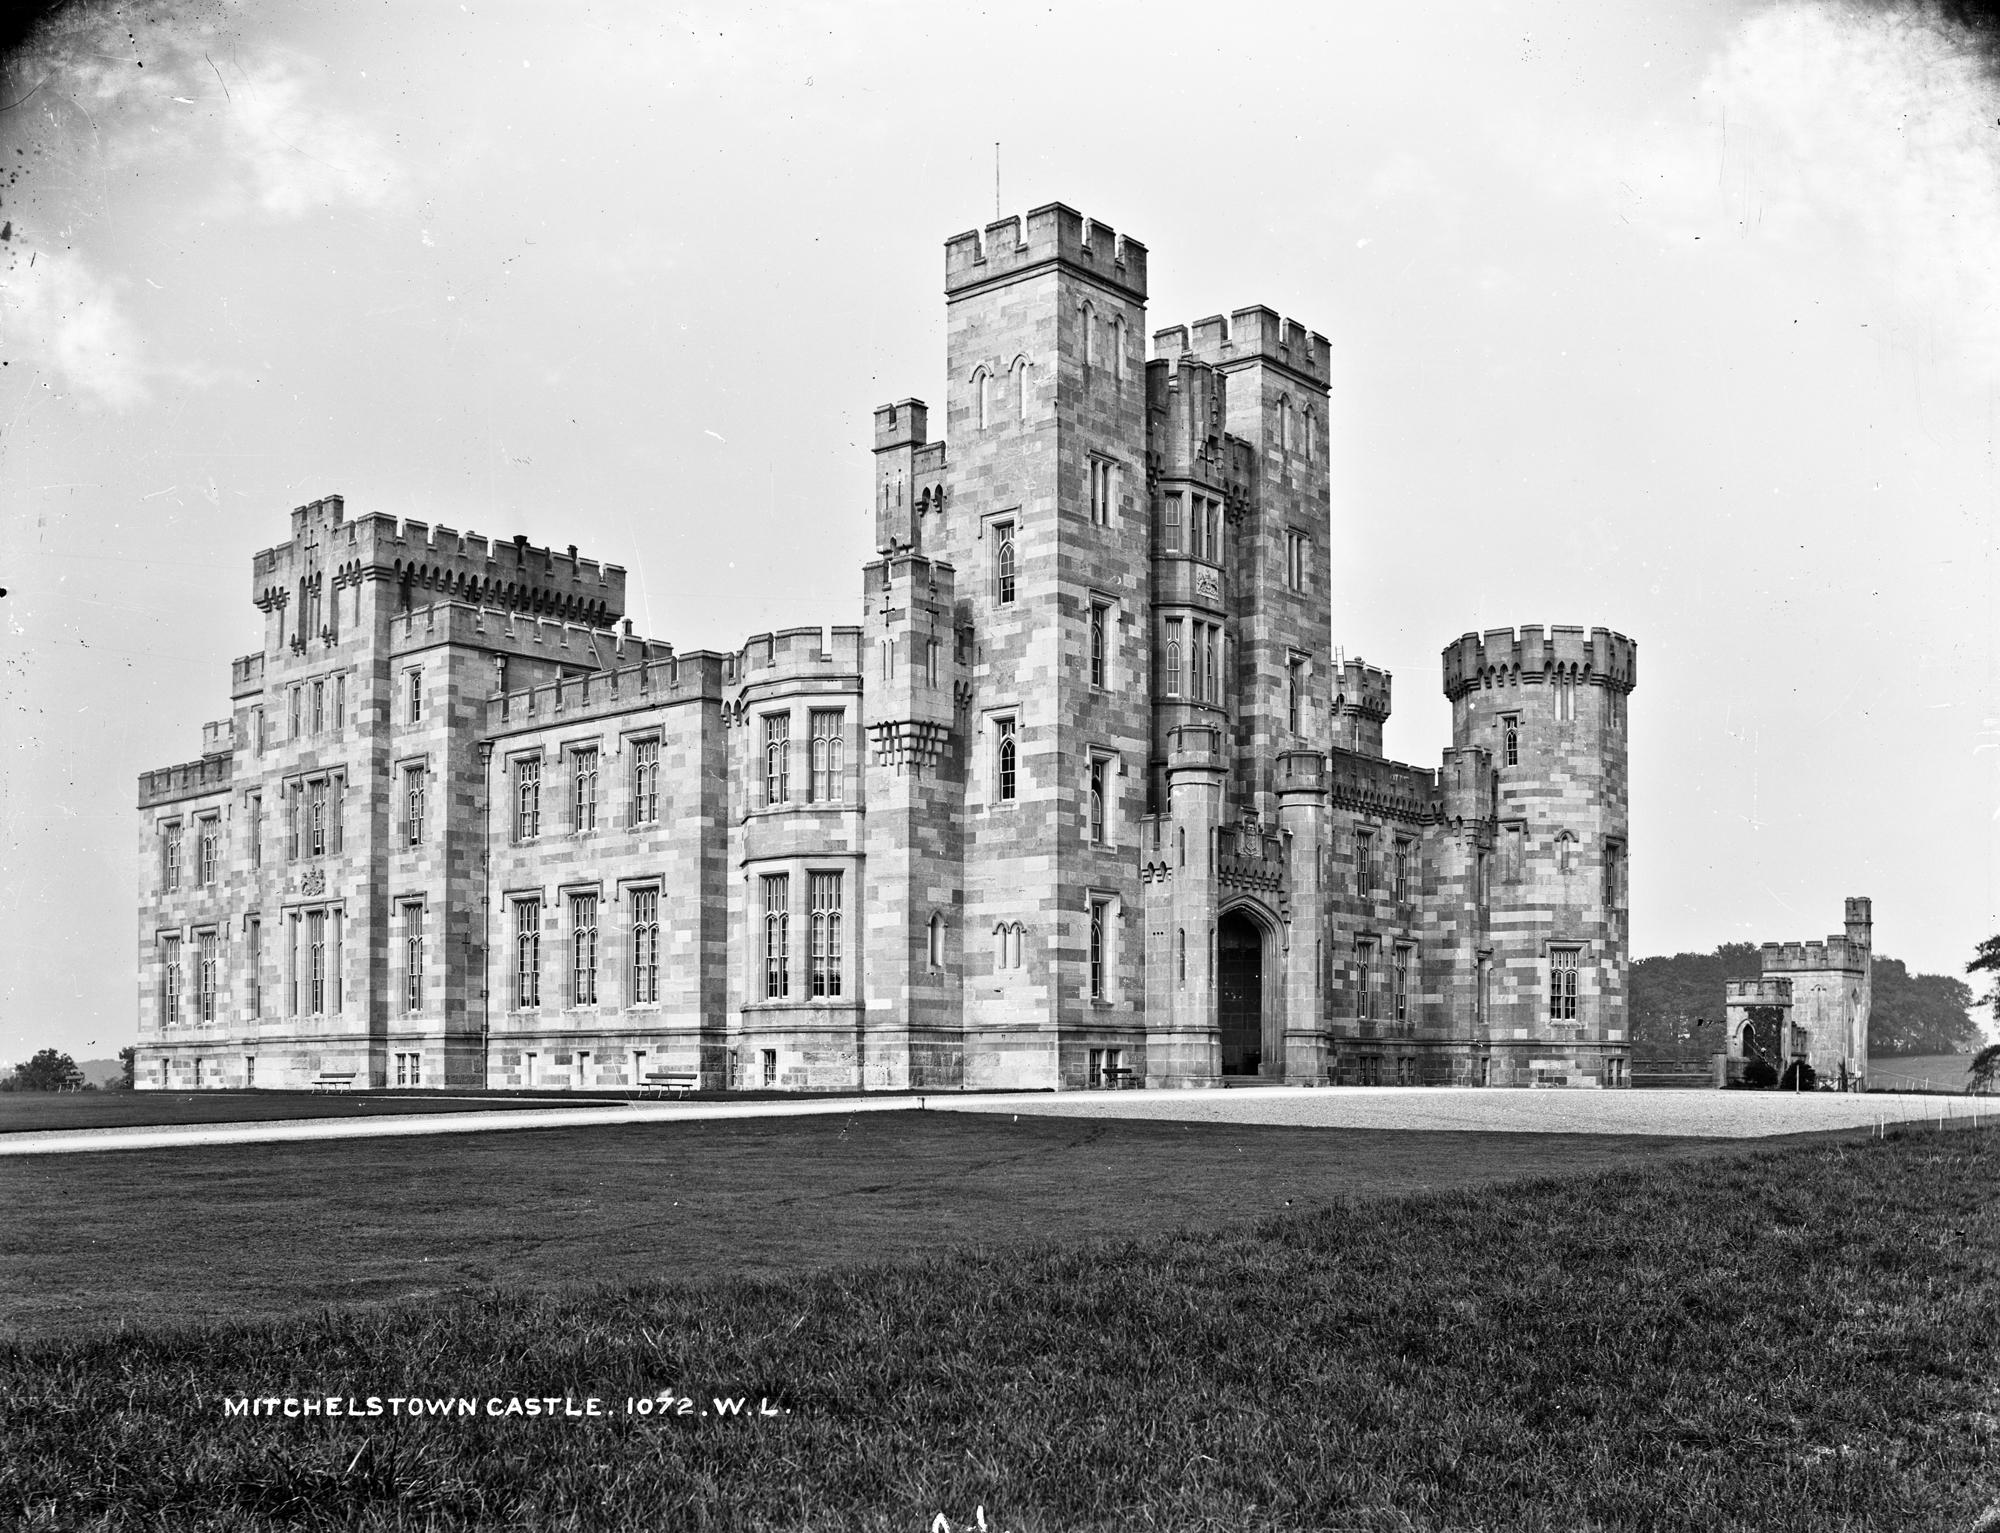 Mitchelstown Castle, Co. Cork